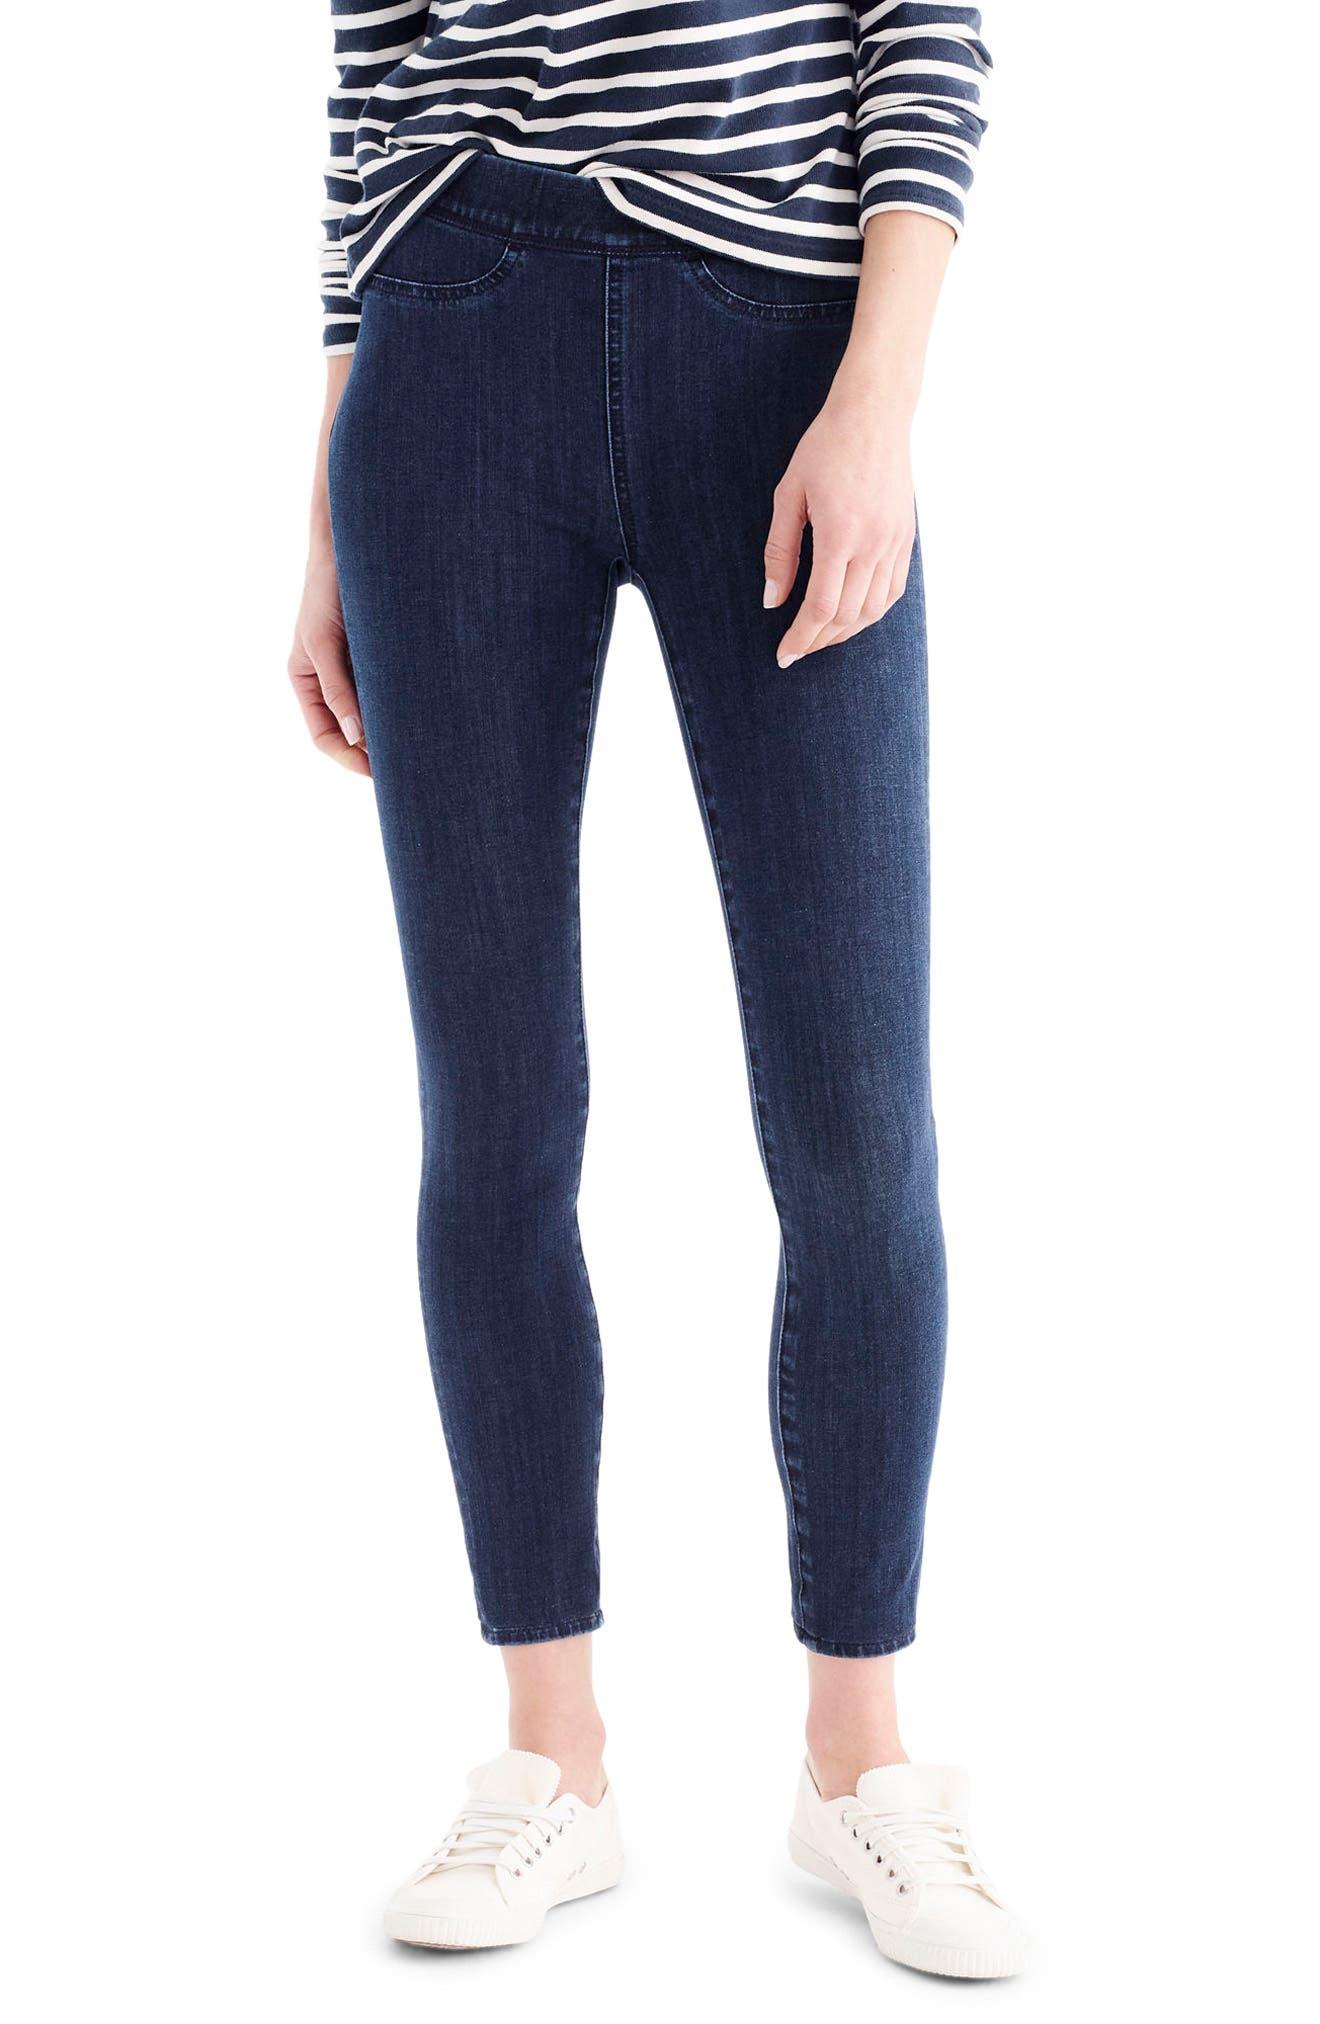 J.Crew Pull-On Toothpick Indigo Jeans (Regular & Petite)